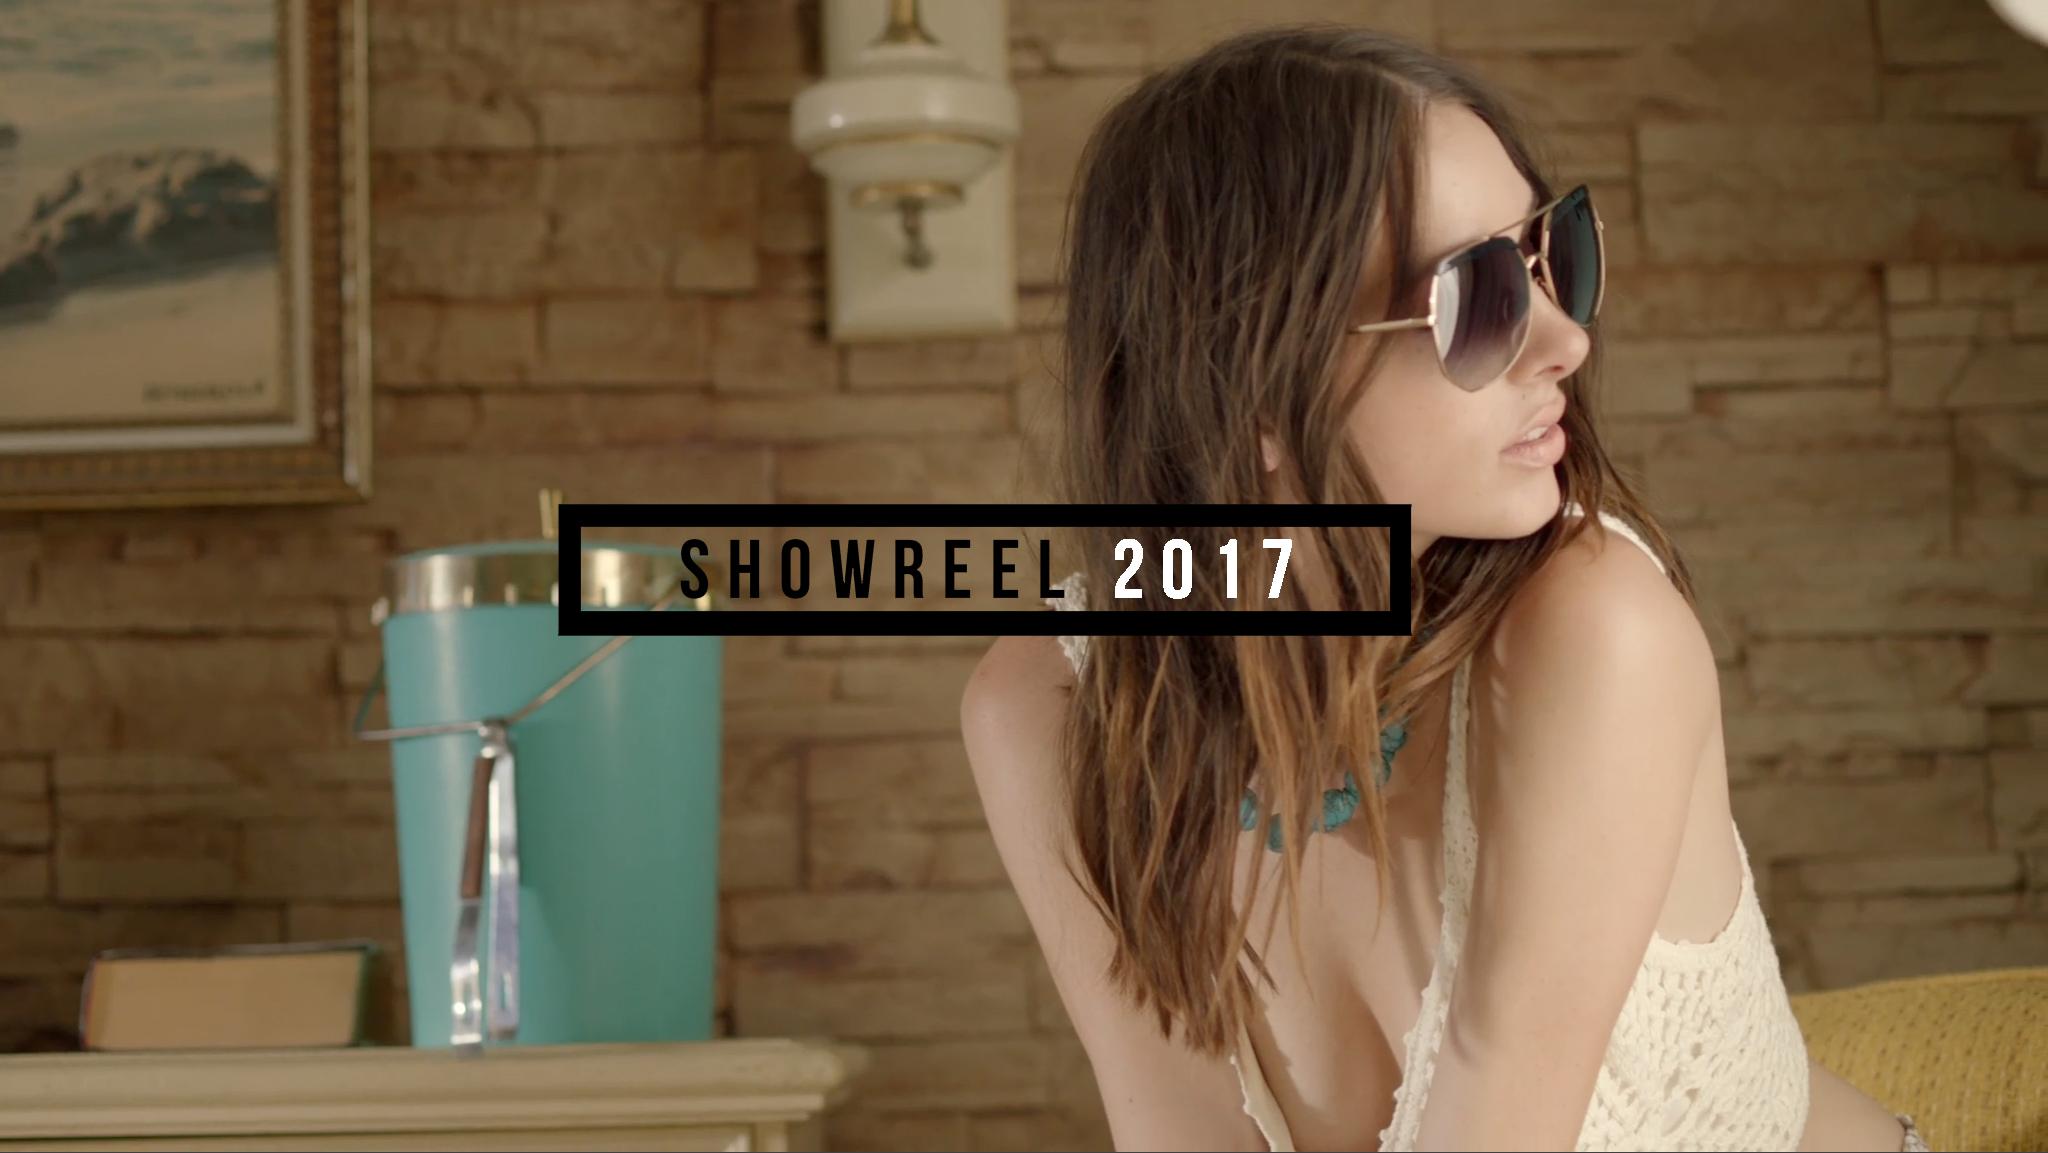 Showreel 2017 Title Image Tiger House Films 2017